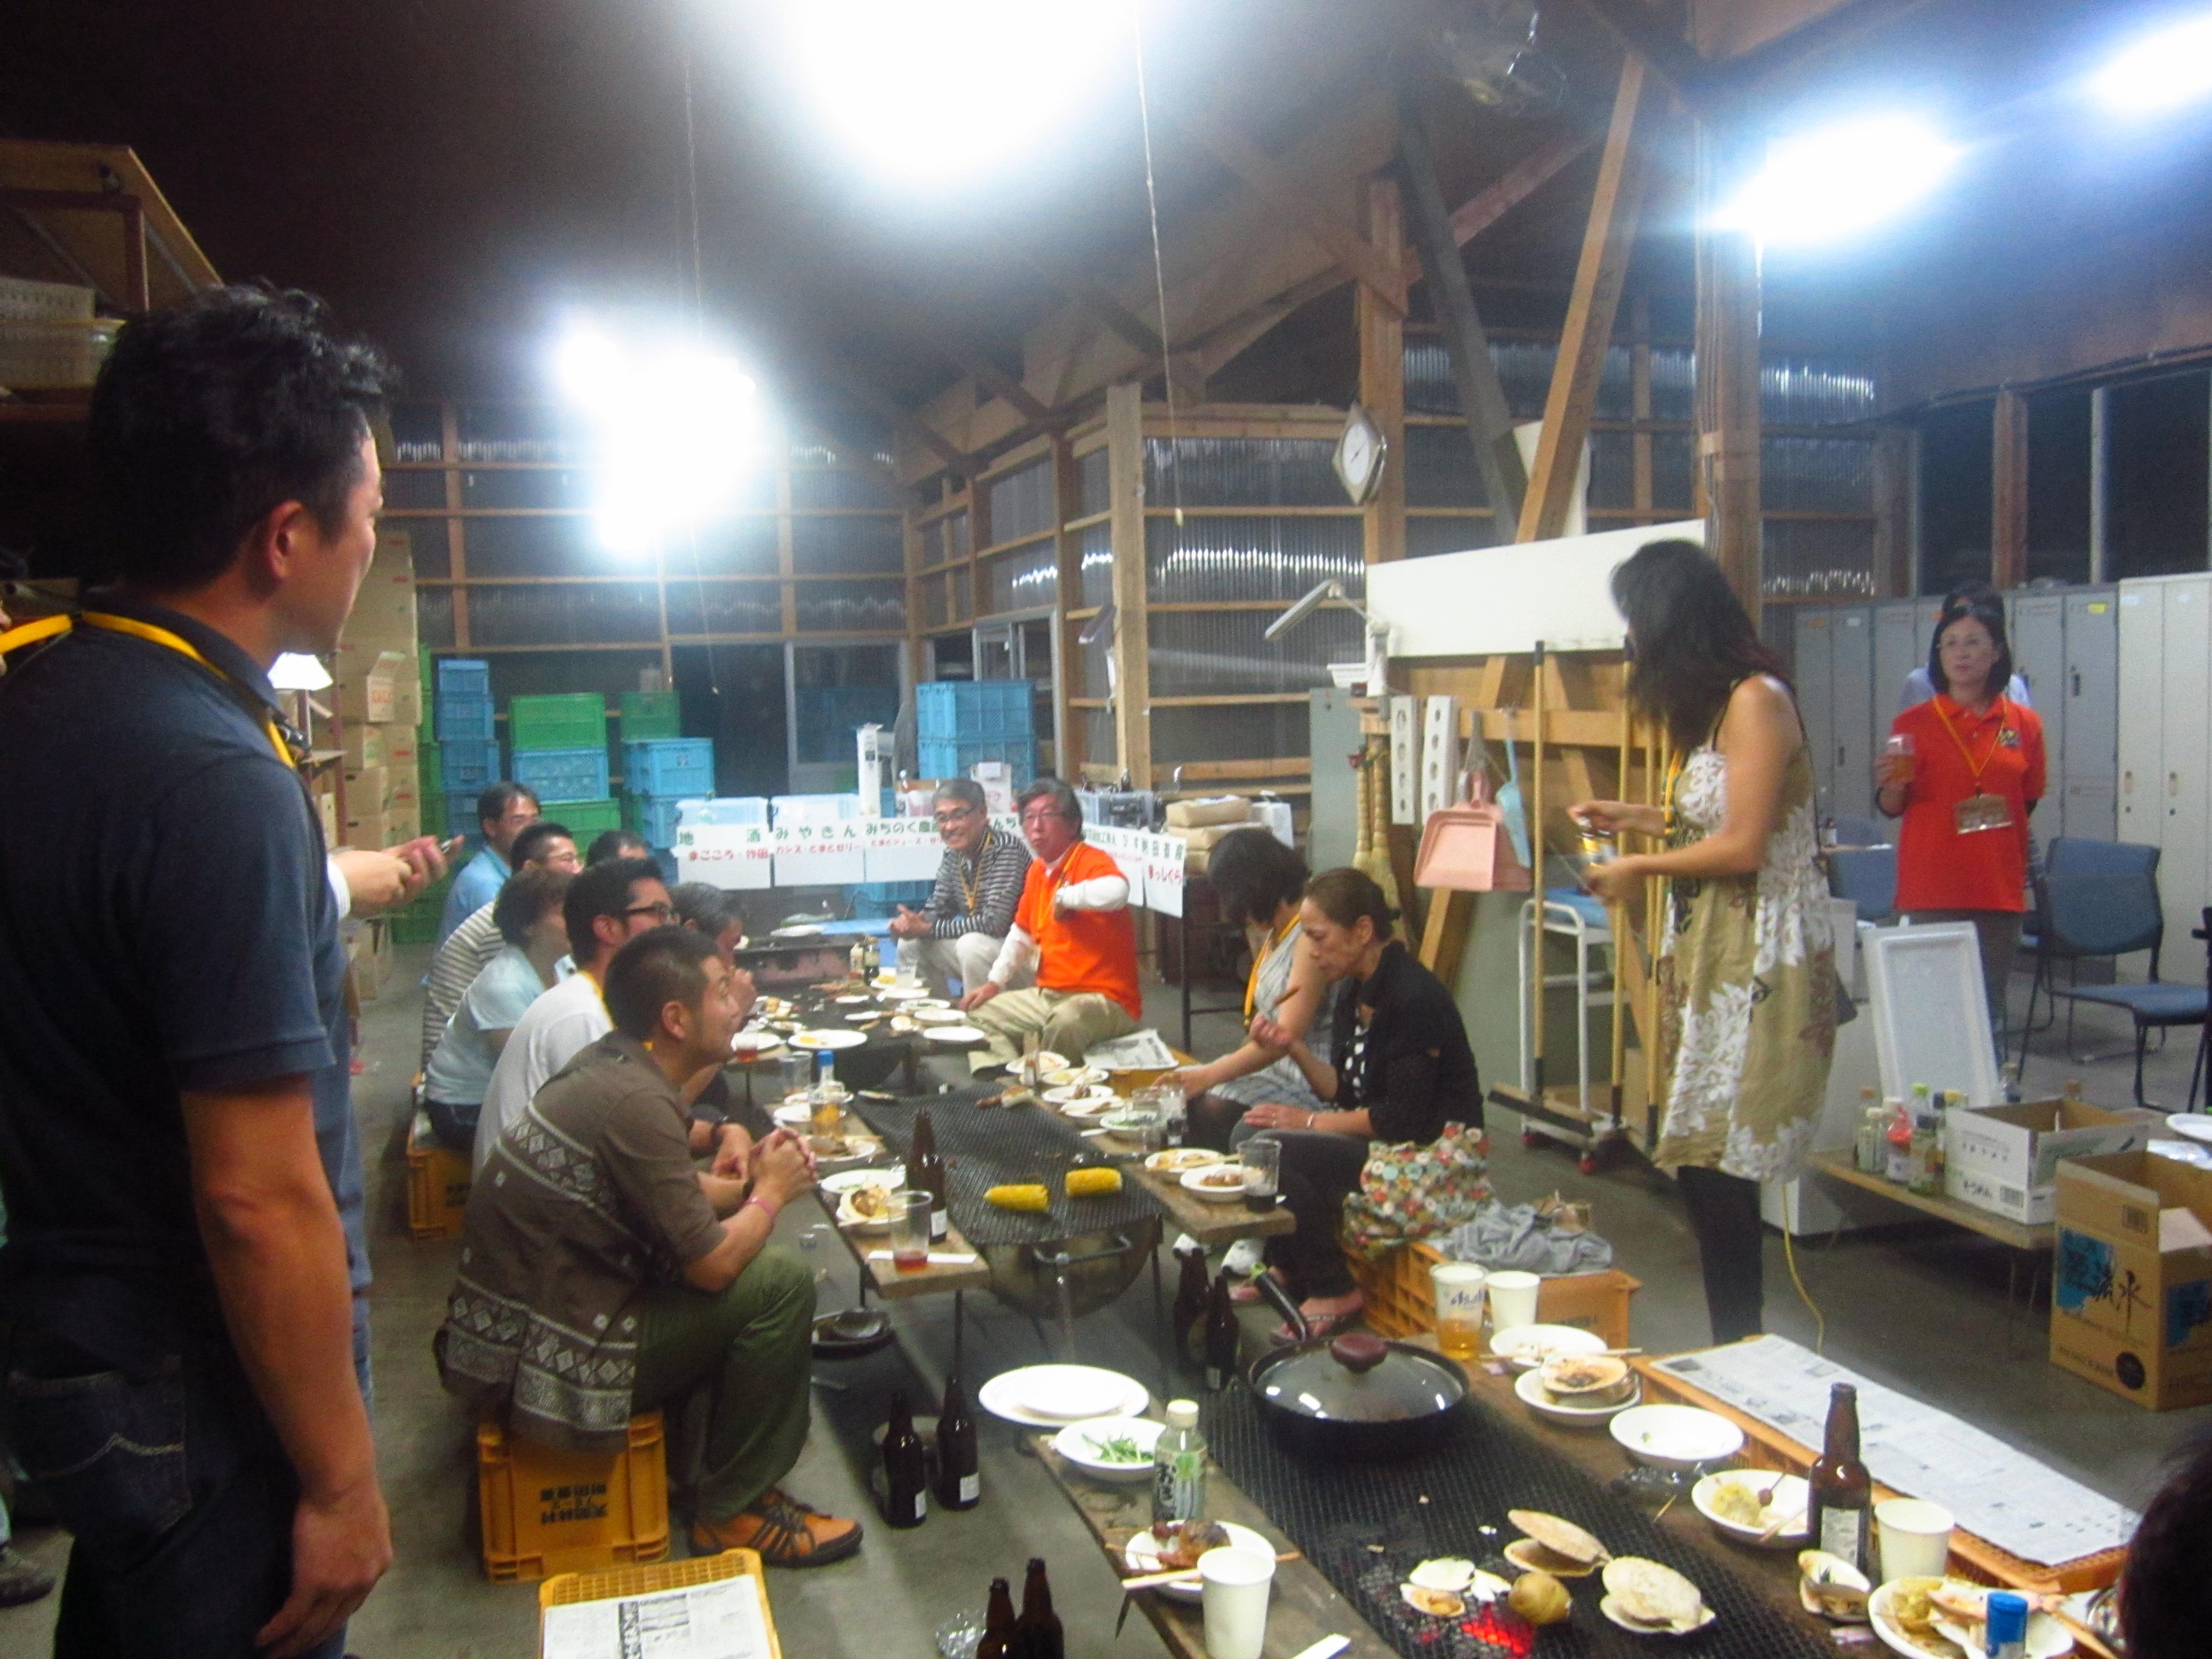 IMG 4306 - 麻布十番納涼祭り25,26日(七戸町出店)